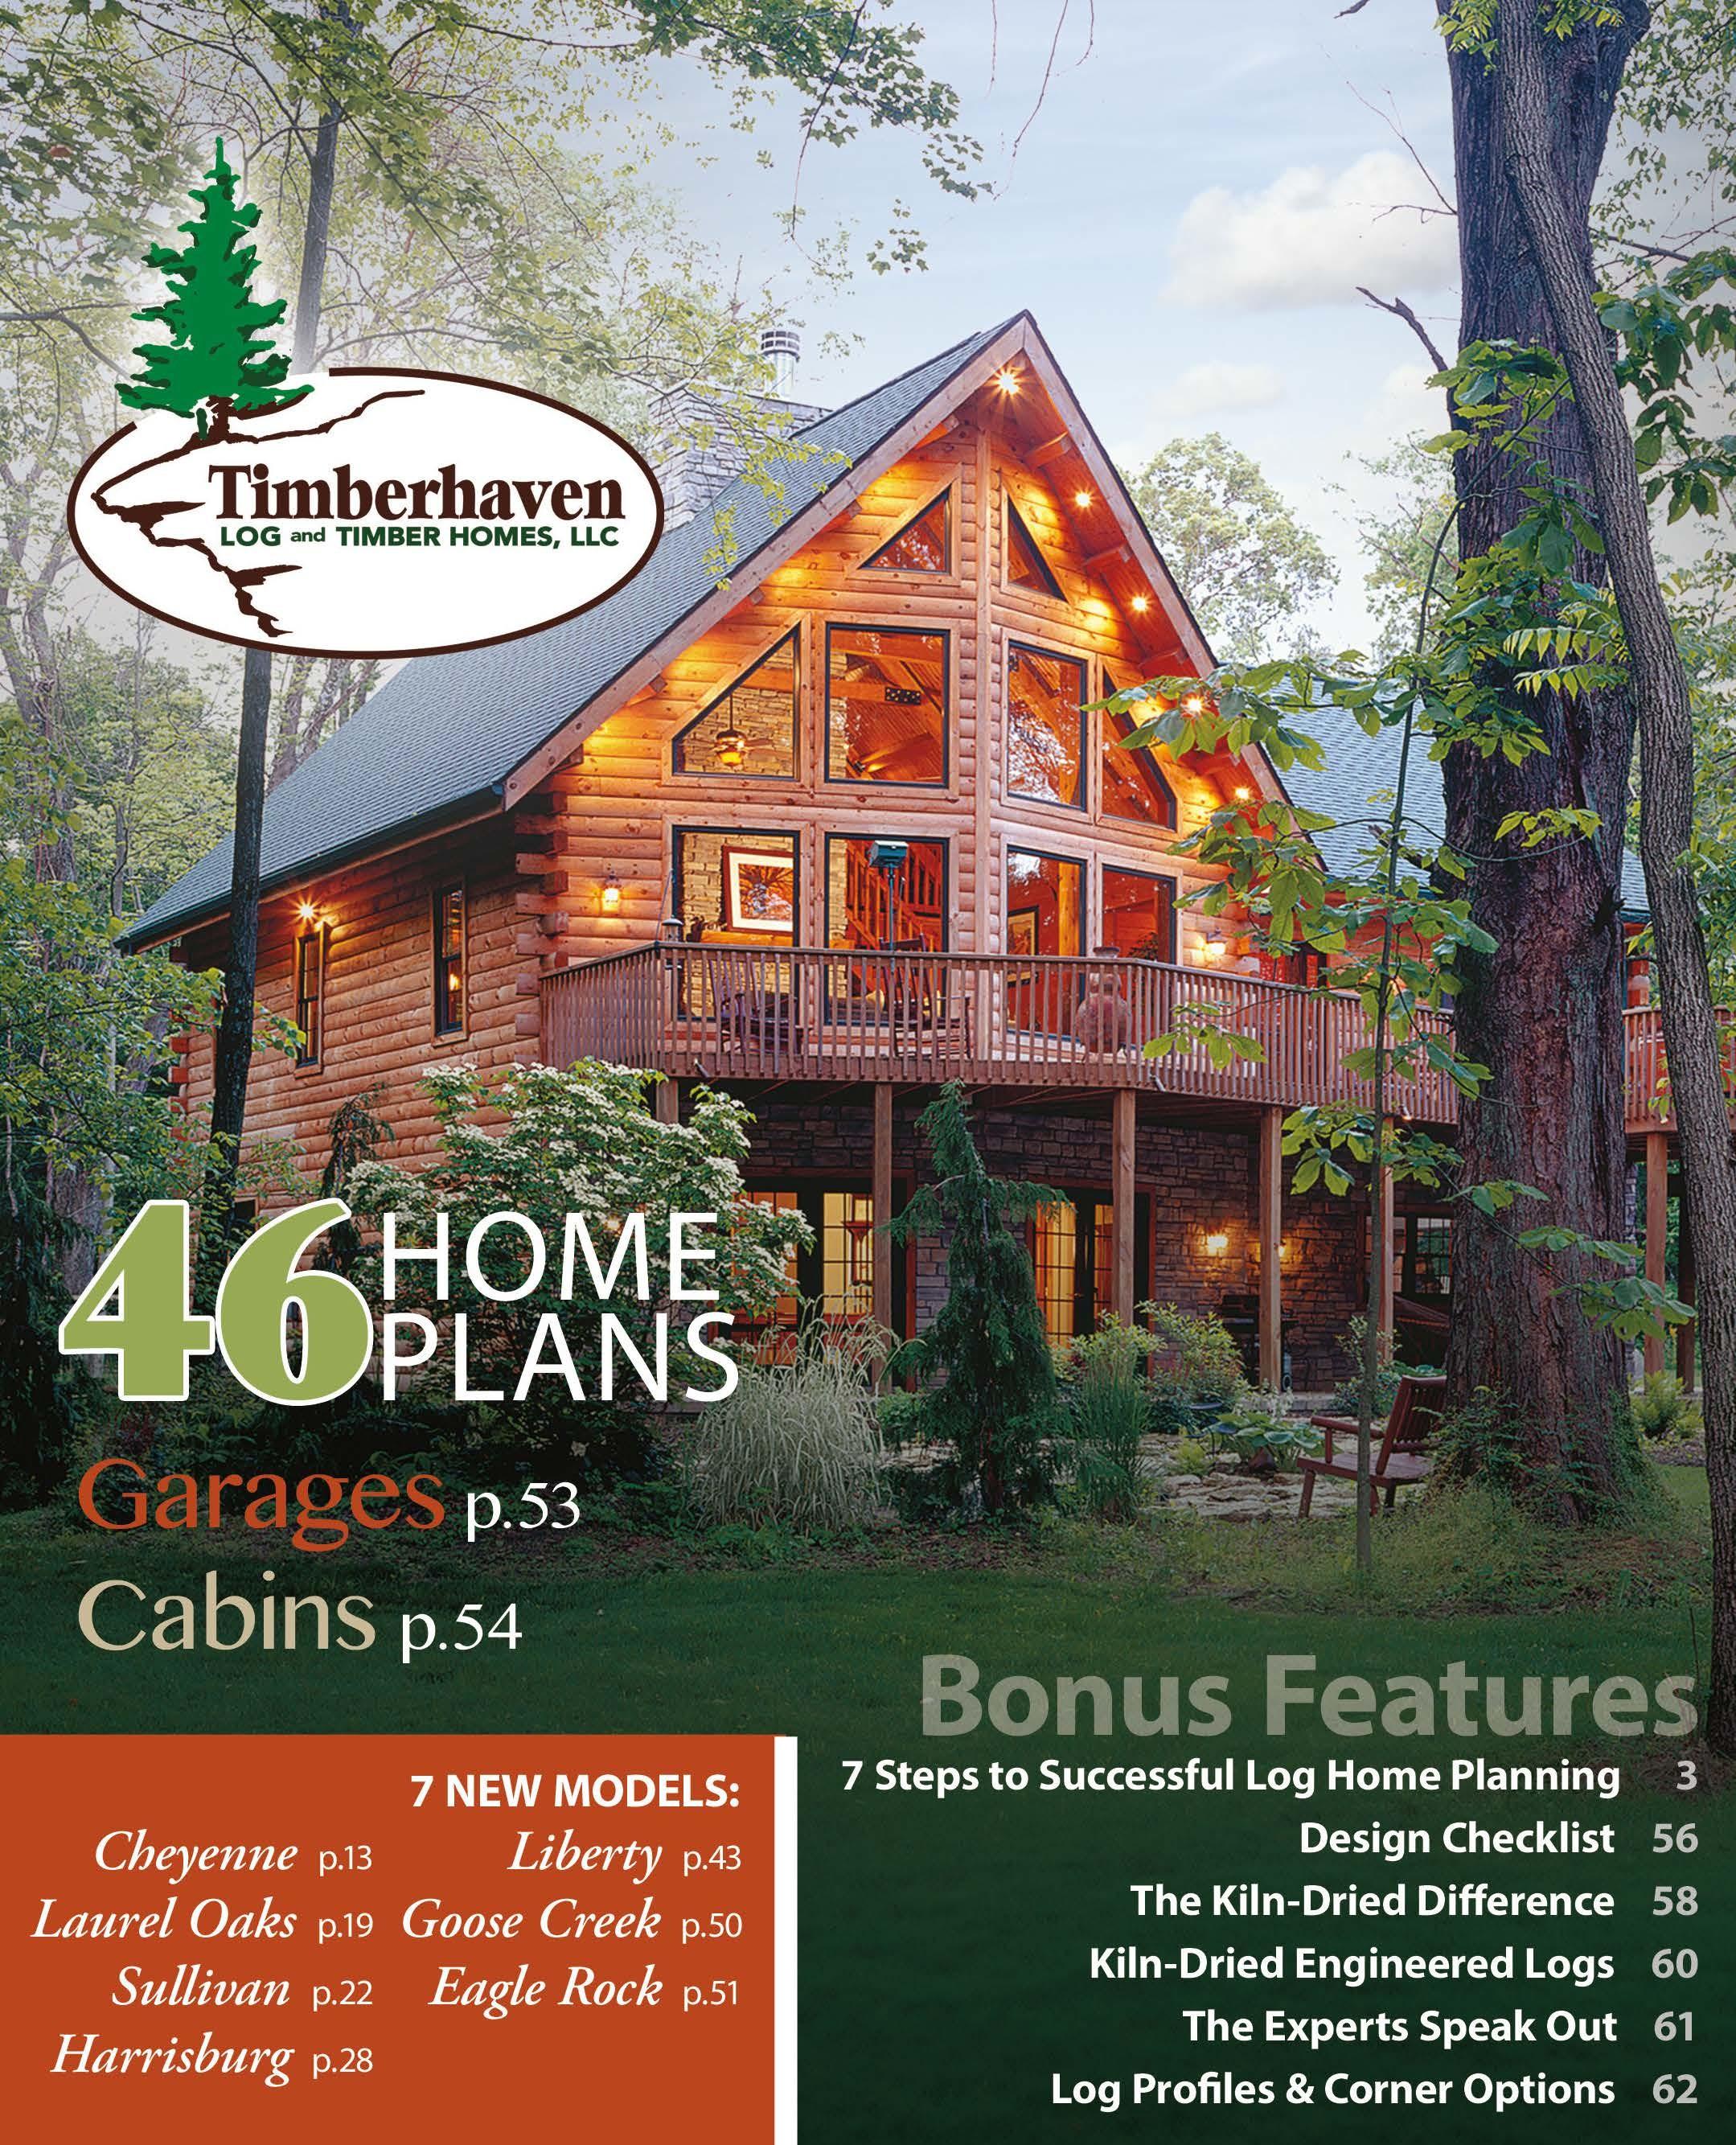 Award Winning Cottage House Plans: NAHB Announces Award-Winning Plan Book